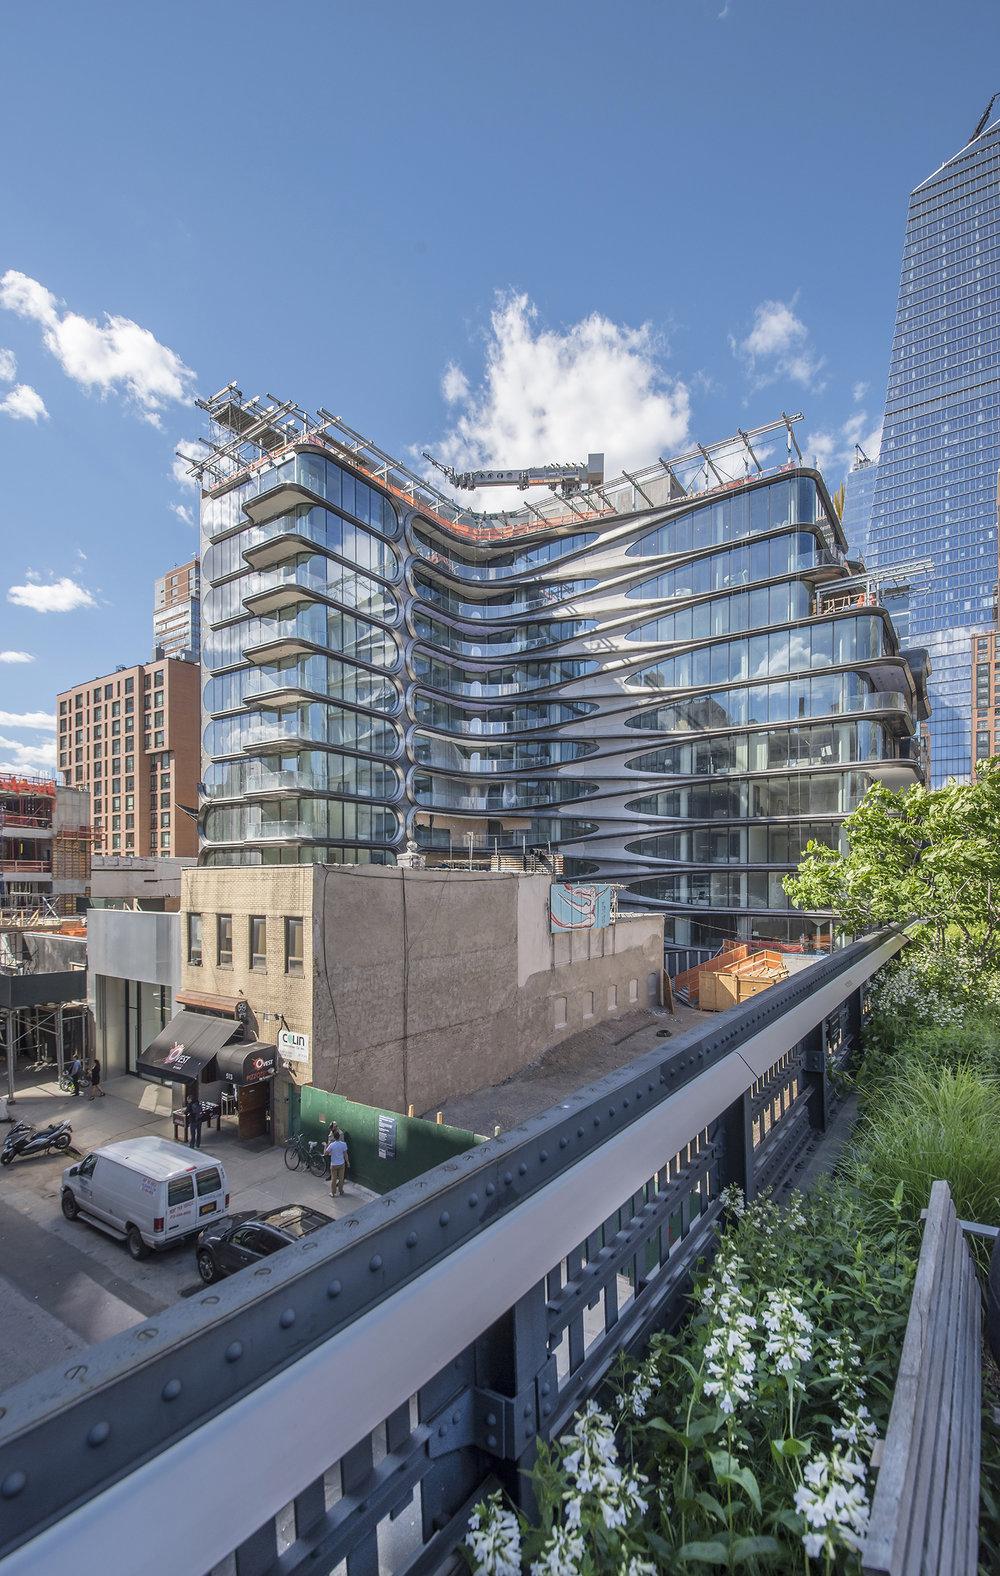 520 West 28th Street, New York - Zaha Hadid